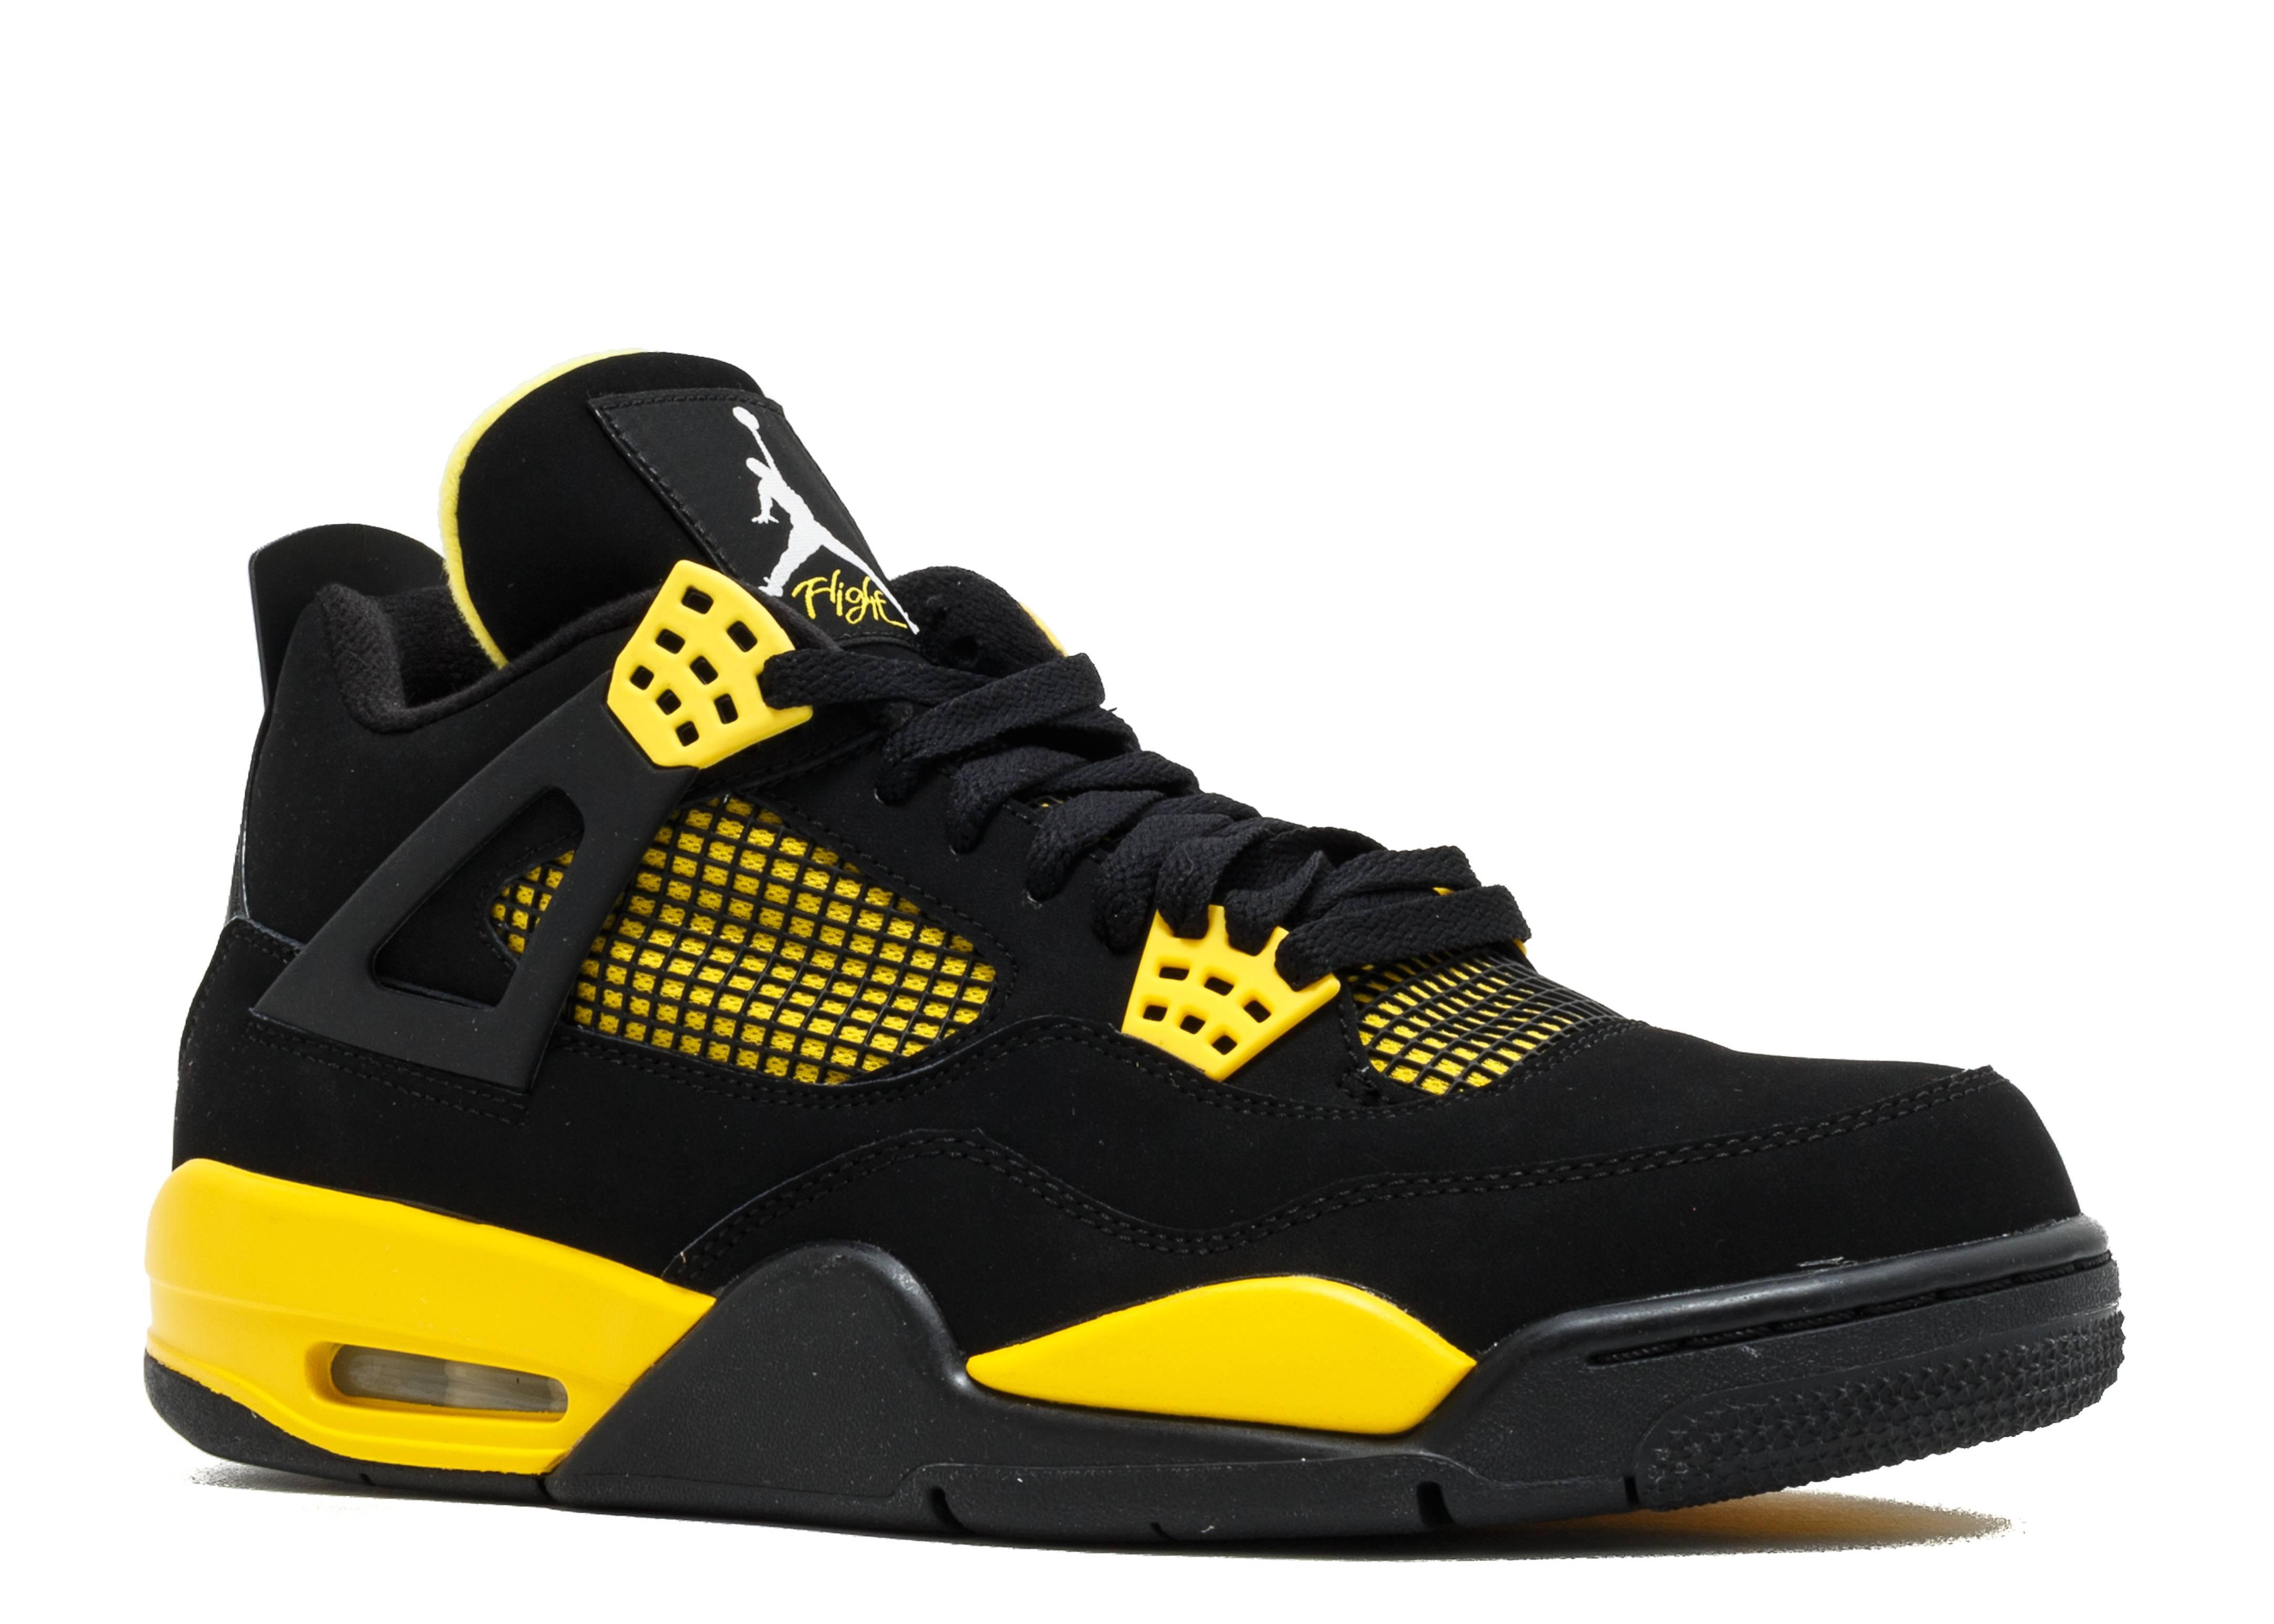 Air Jordan 4 Black Yellow